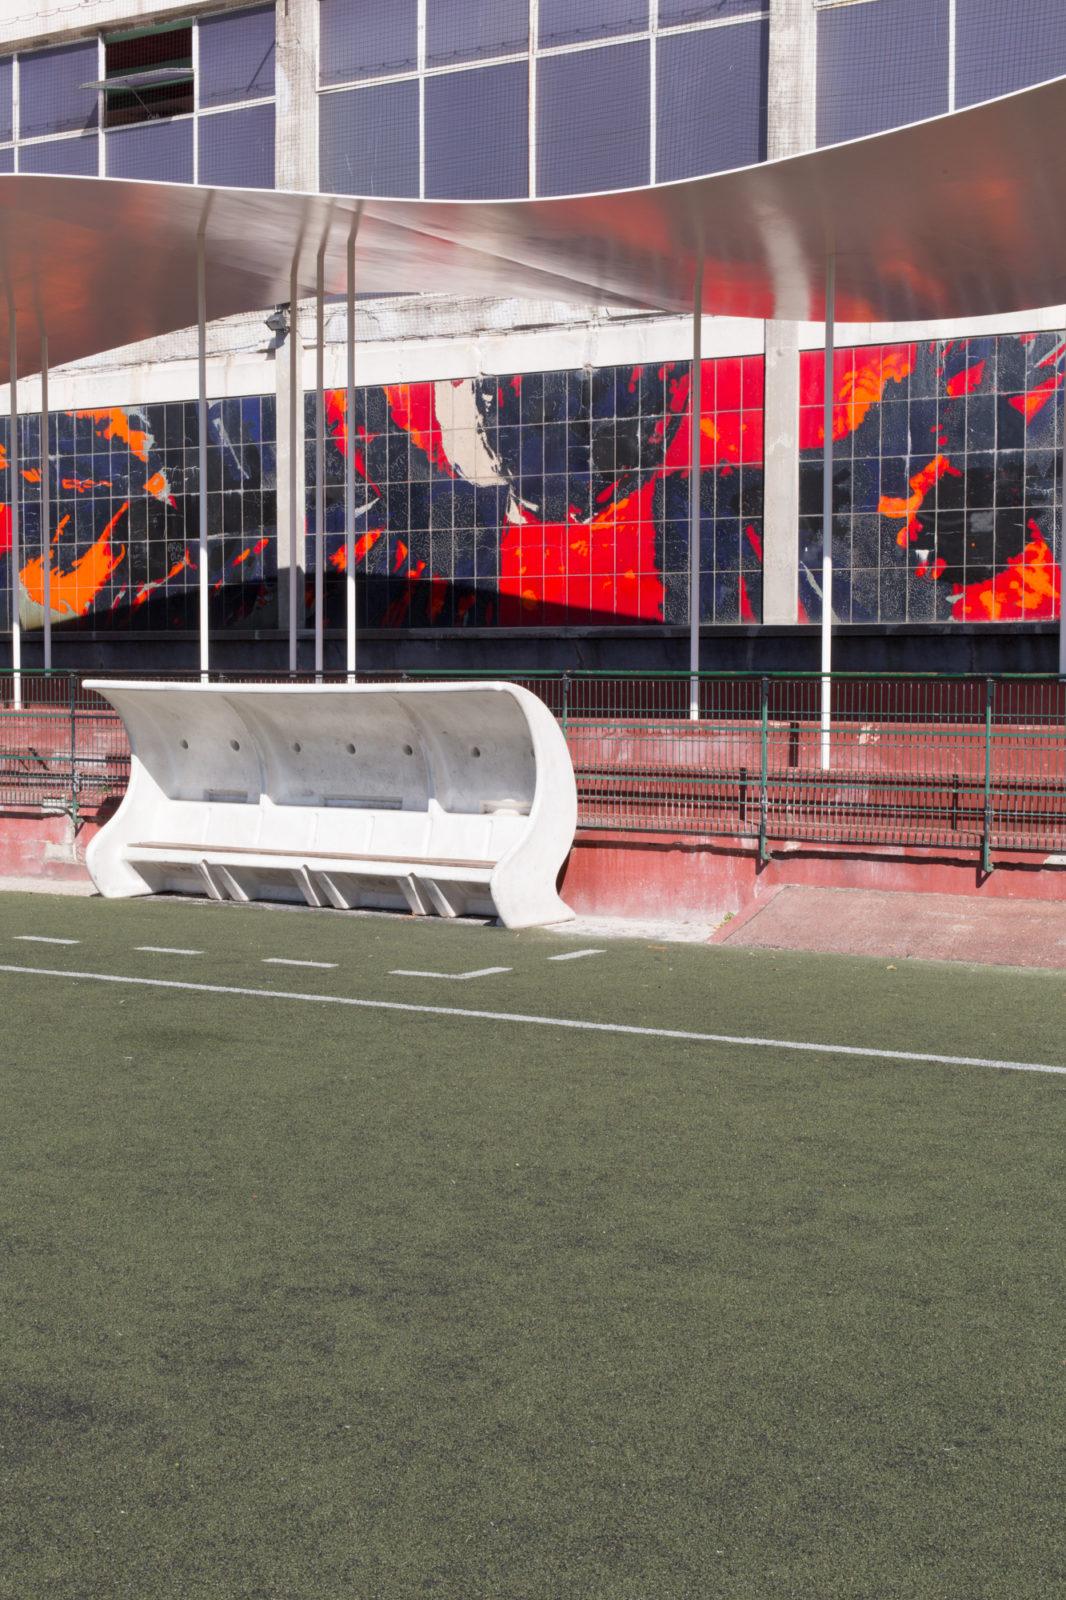 Severine-stade-auventsept-ld-48